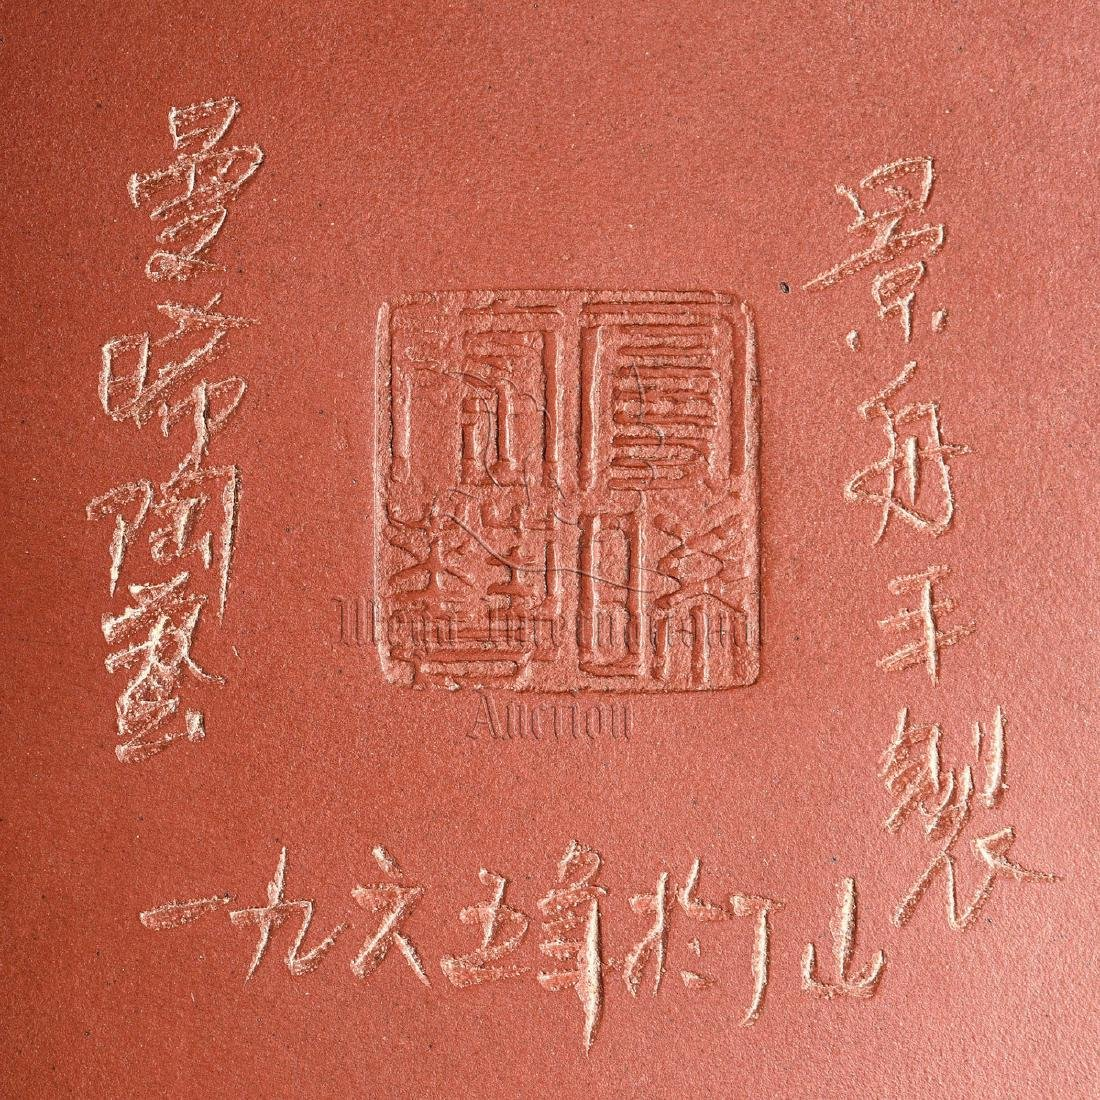 YIXING ZISHA 'CHAIRMAN MAO' TEAPOT - 4